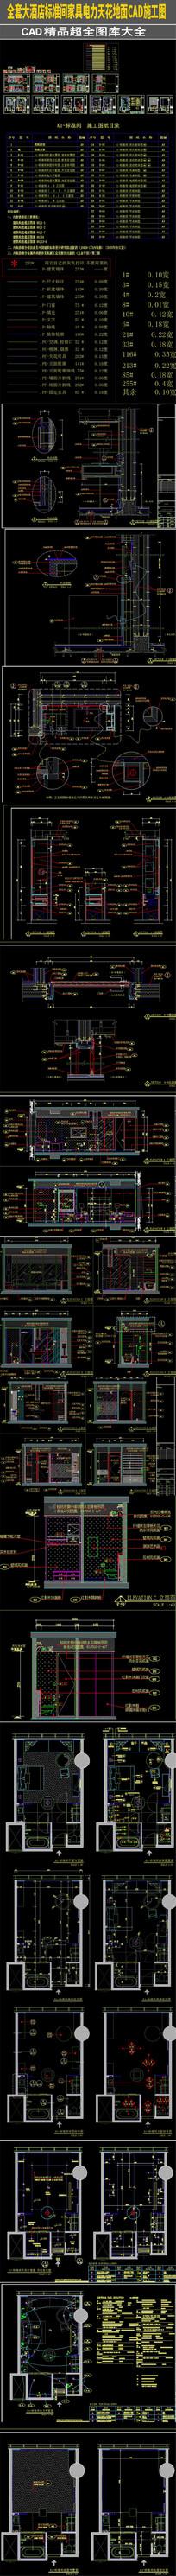 大酒店标准间CAD施工图